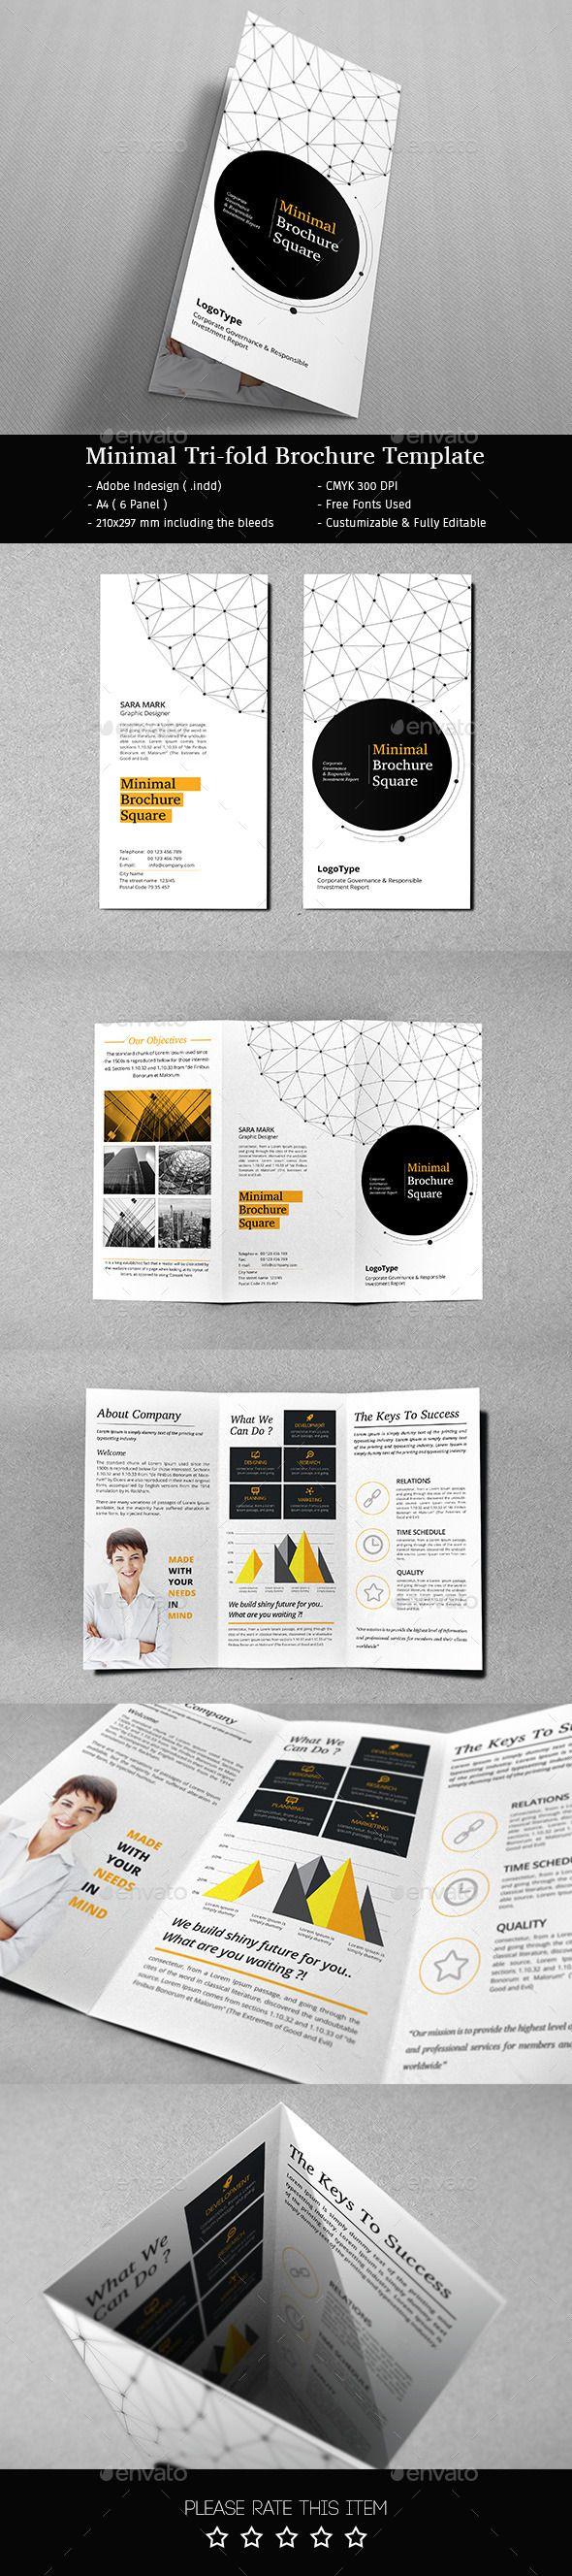 Minimal Tri-fold Brochure Template #brochure #design Download: http://graphicriver.net/item/minimal-trifold-brochure/12587318?ref=ksioks